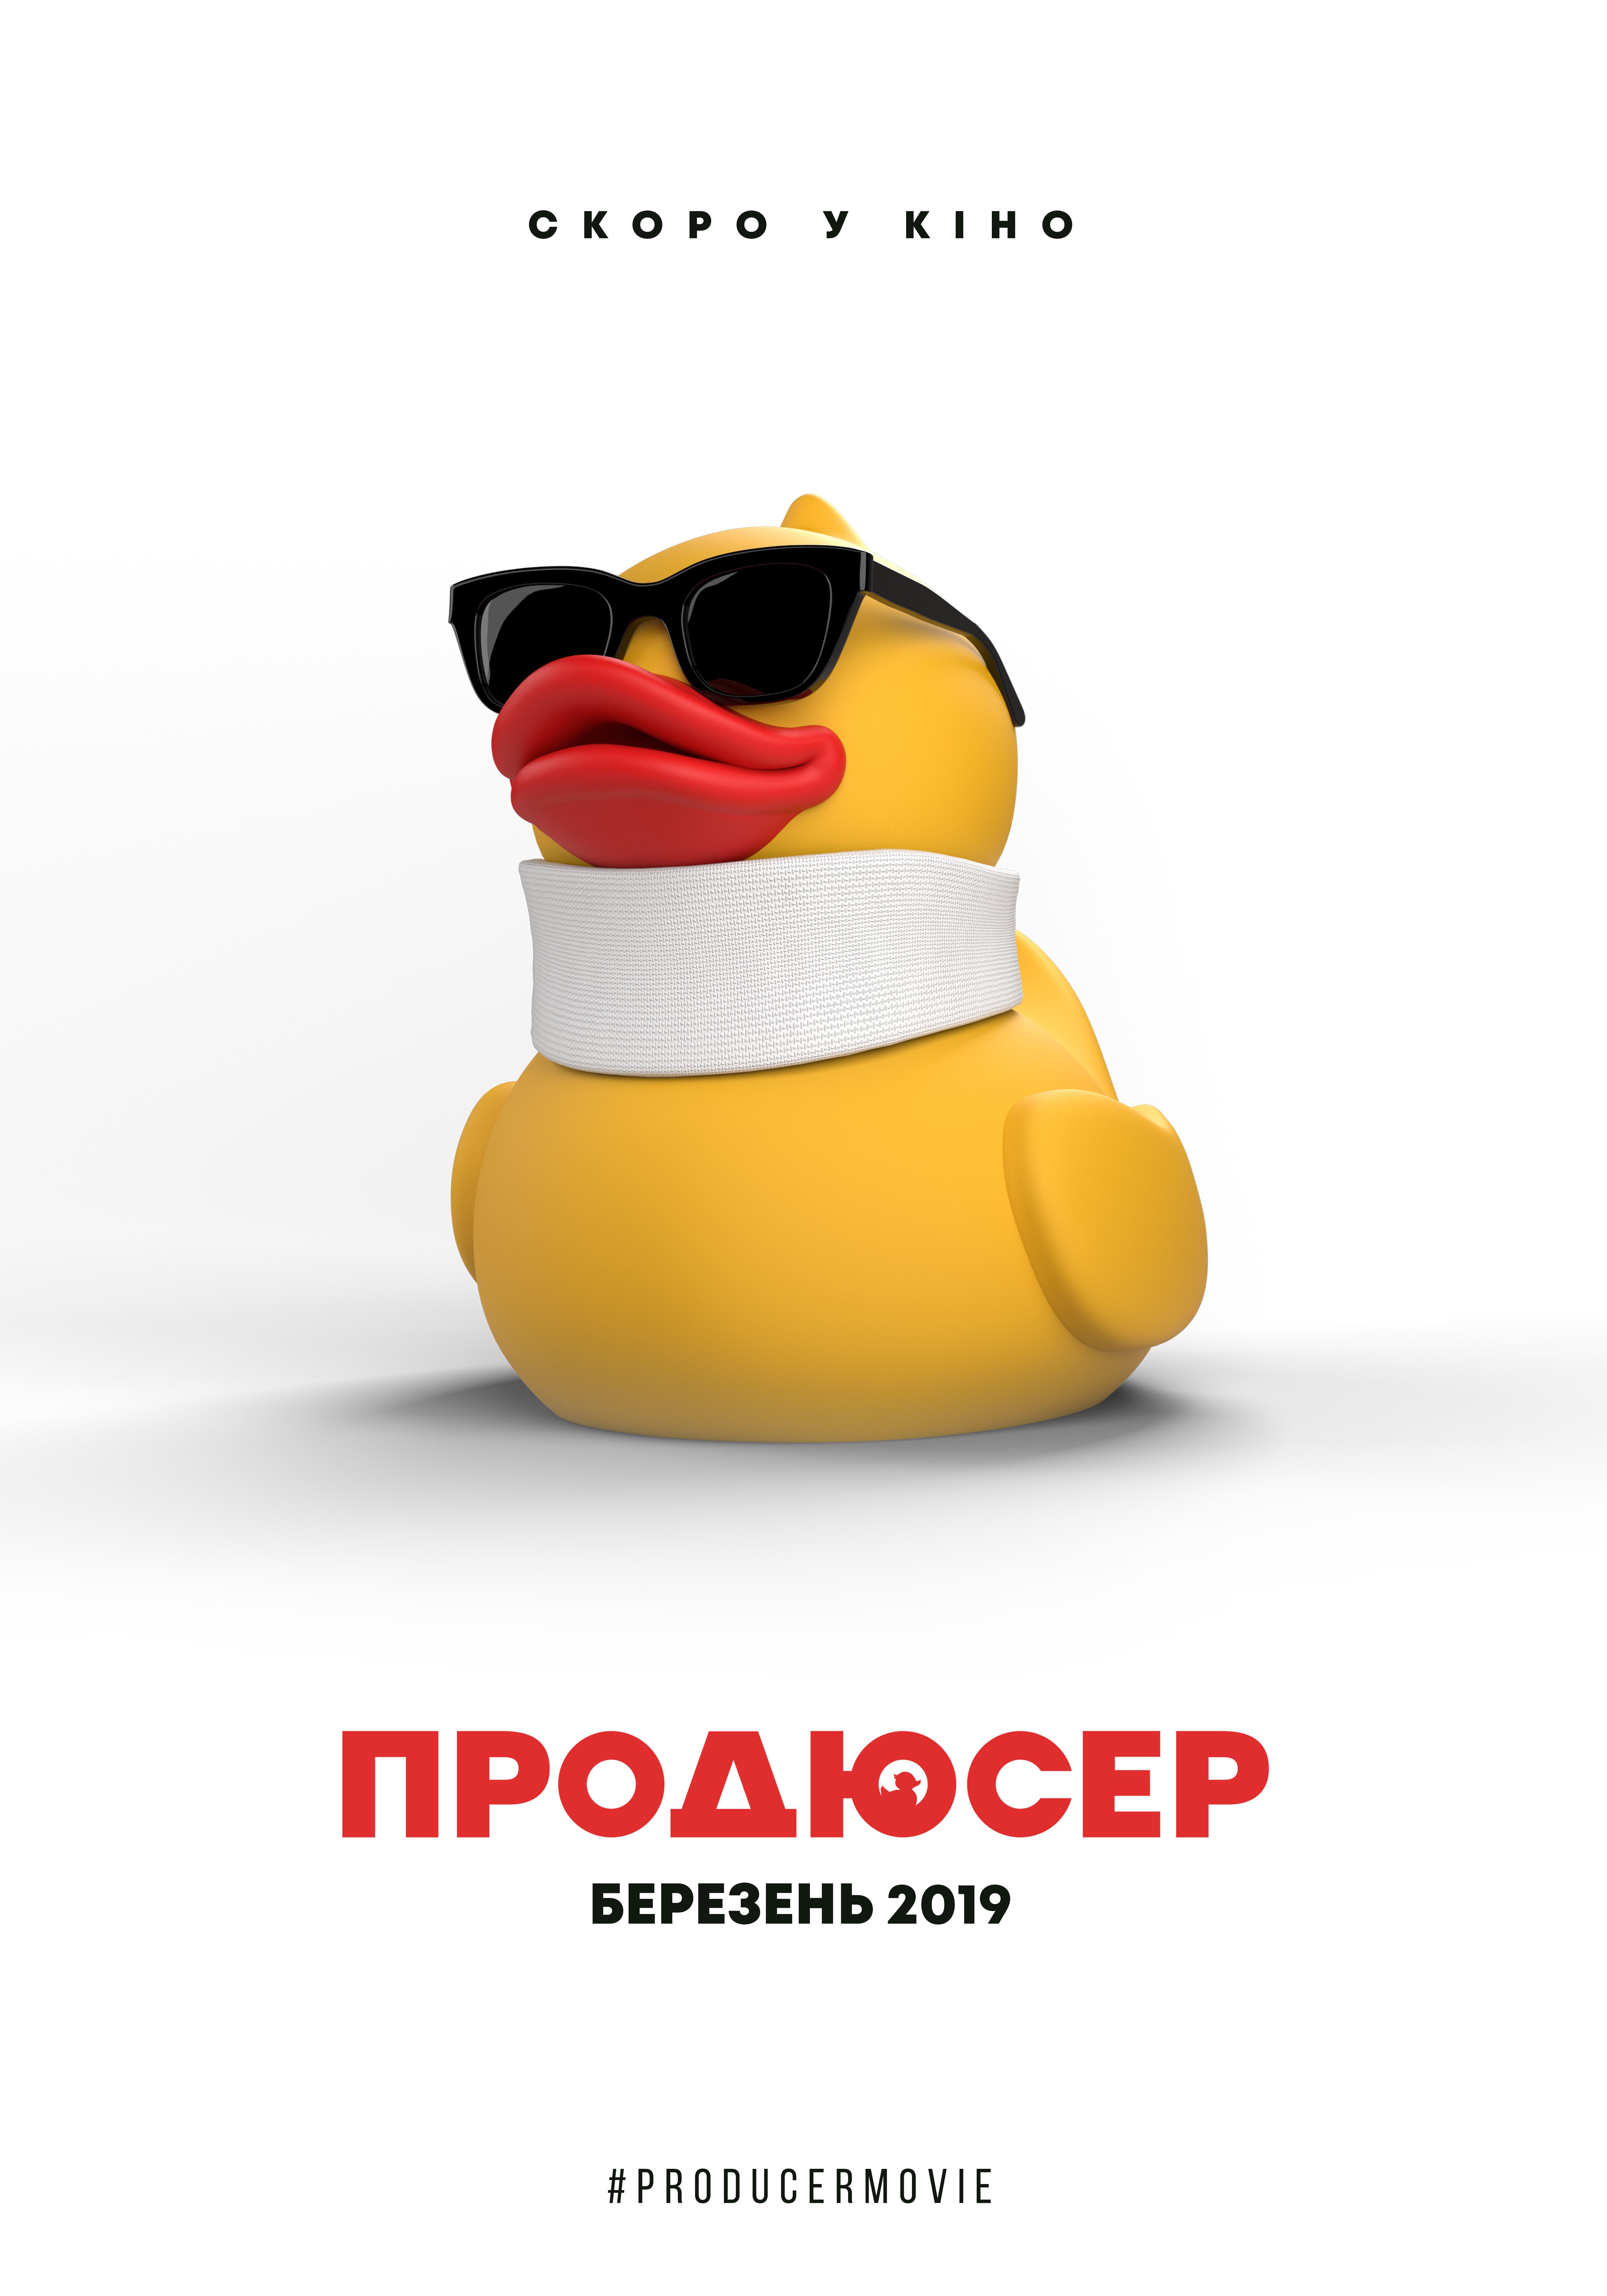 Продюсер постер